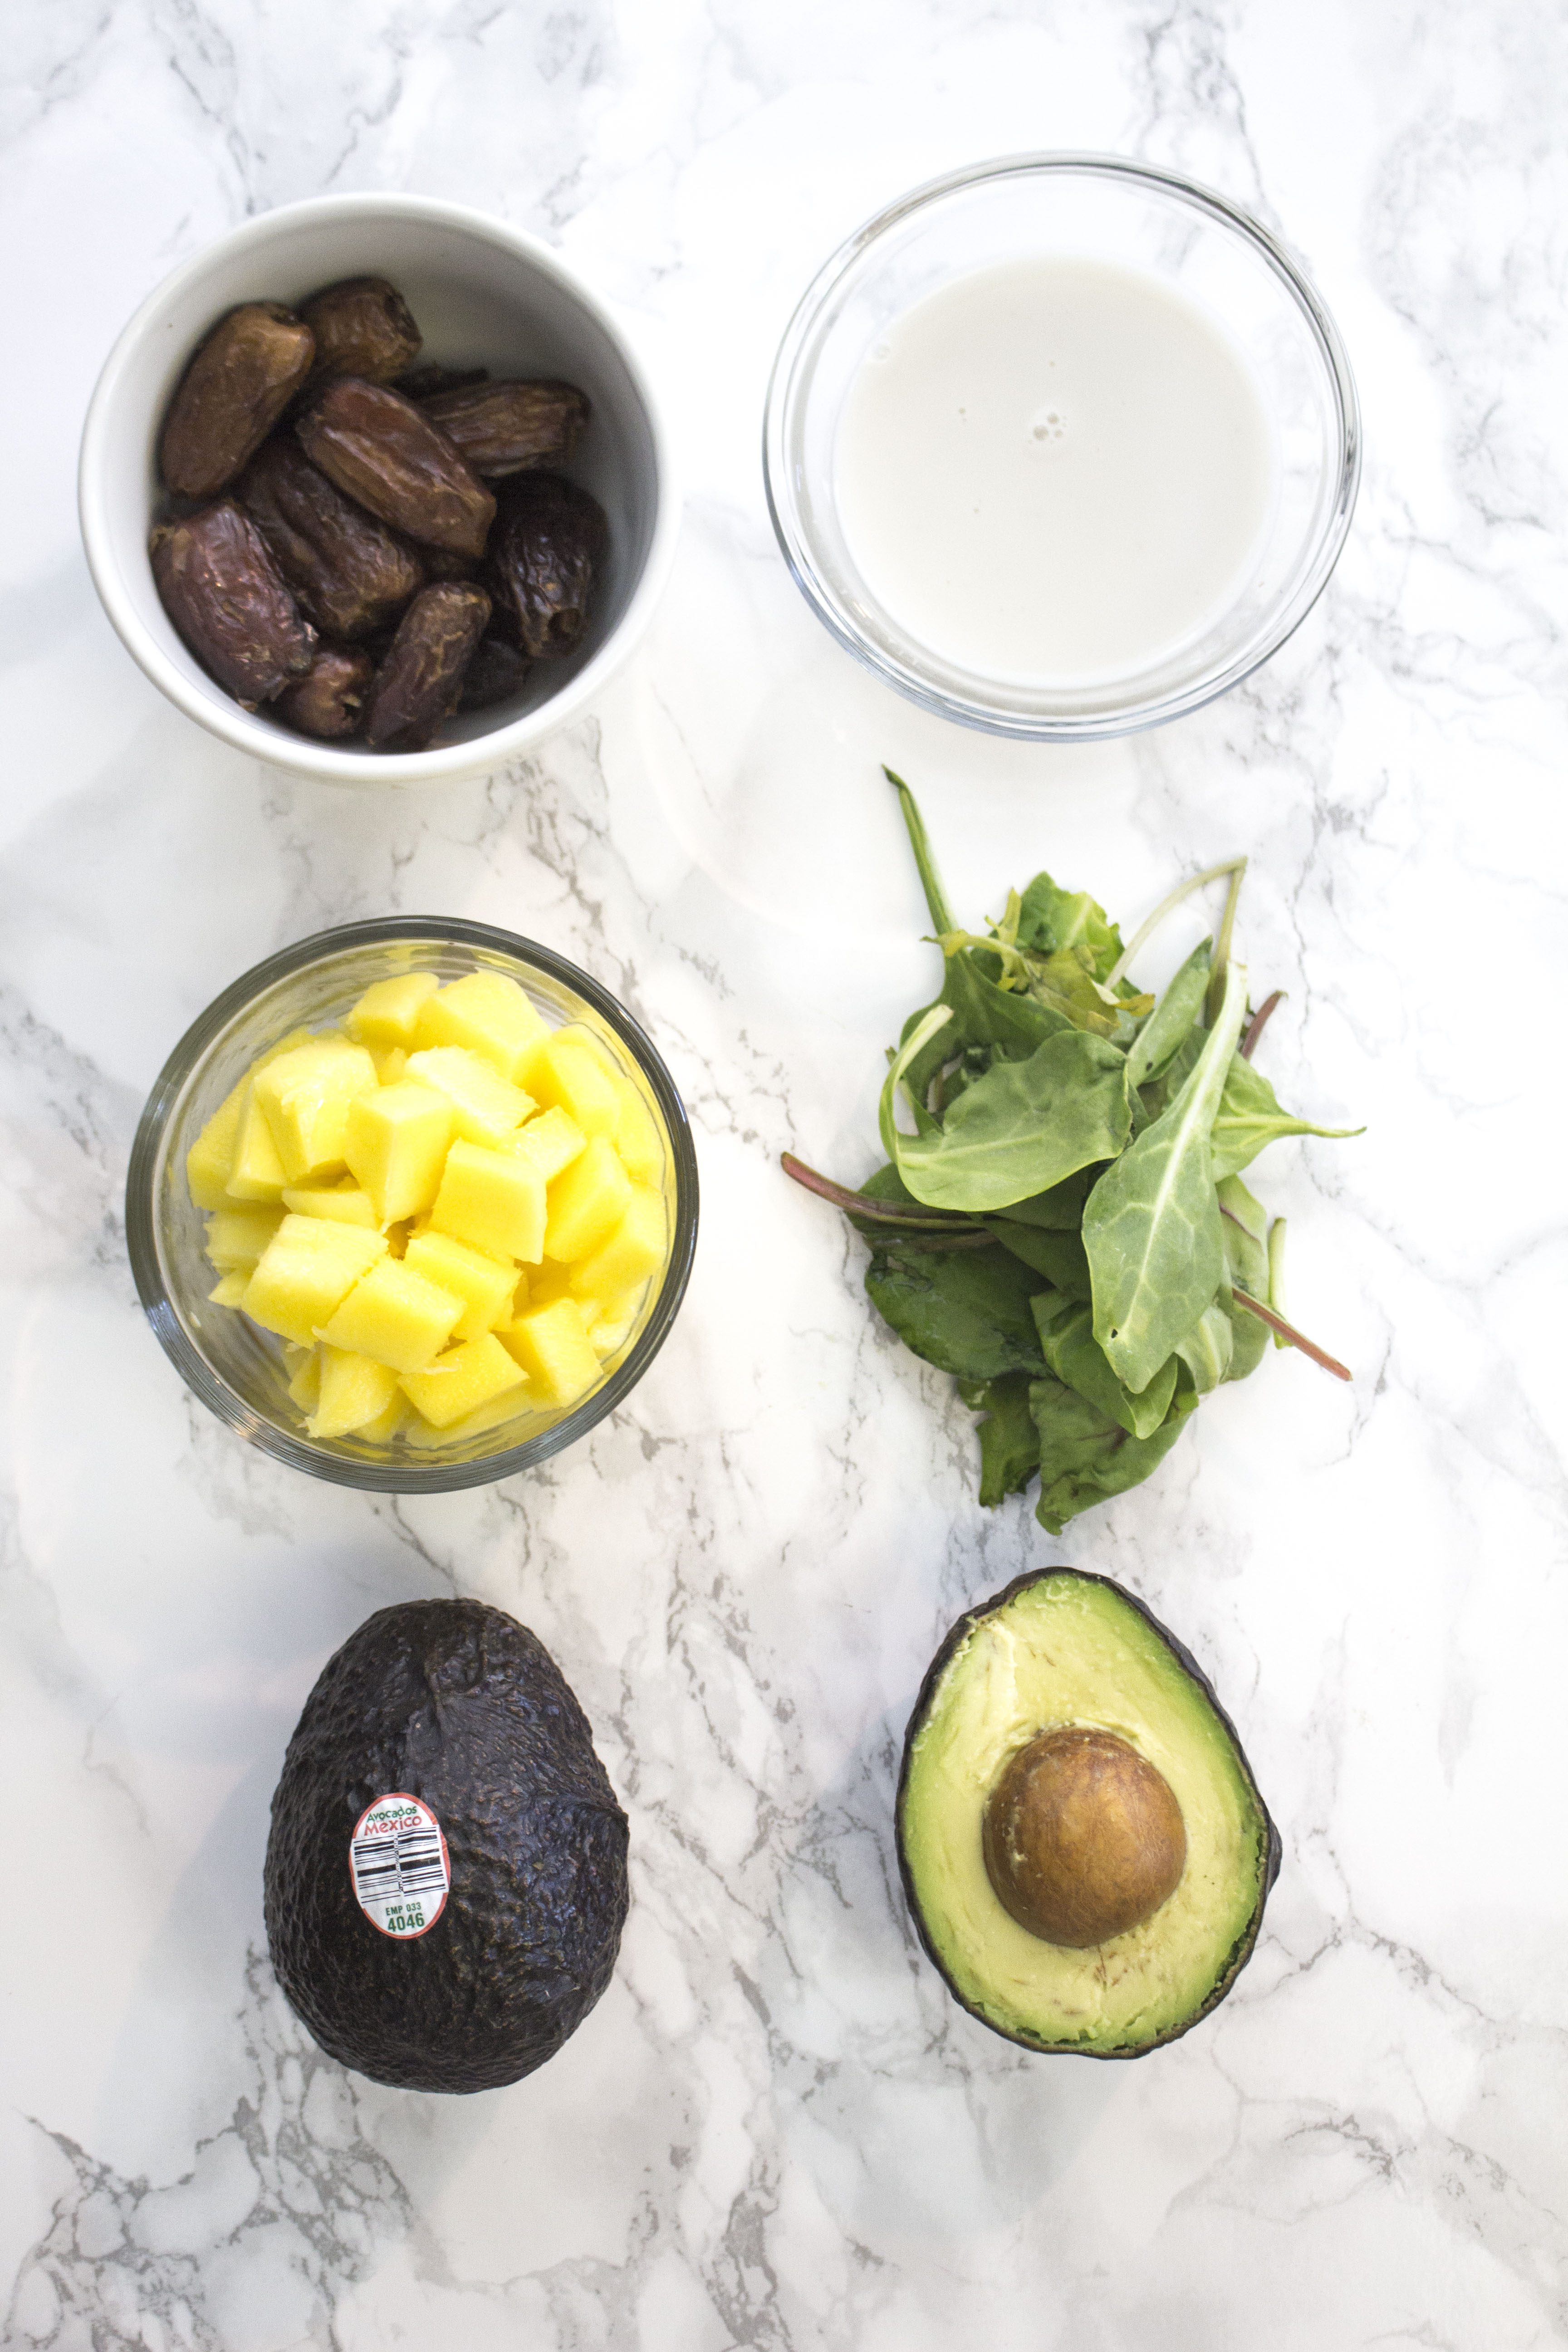 Avocado-Mango Energy Smoothie